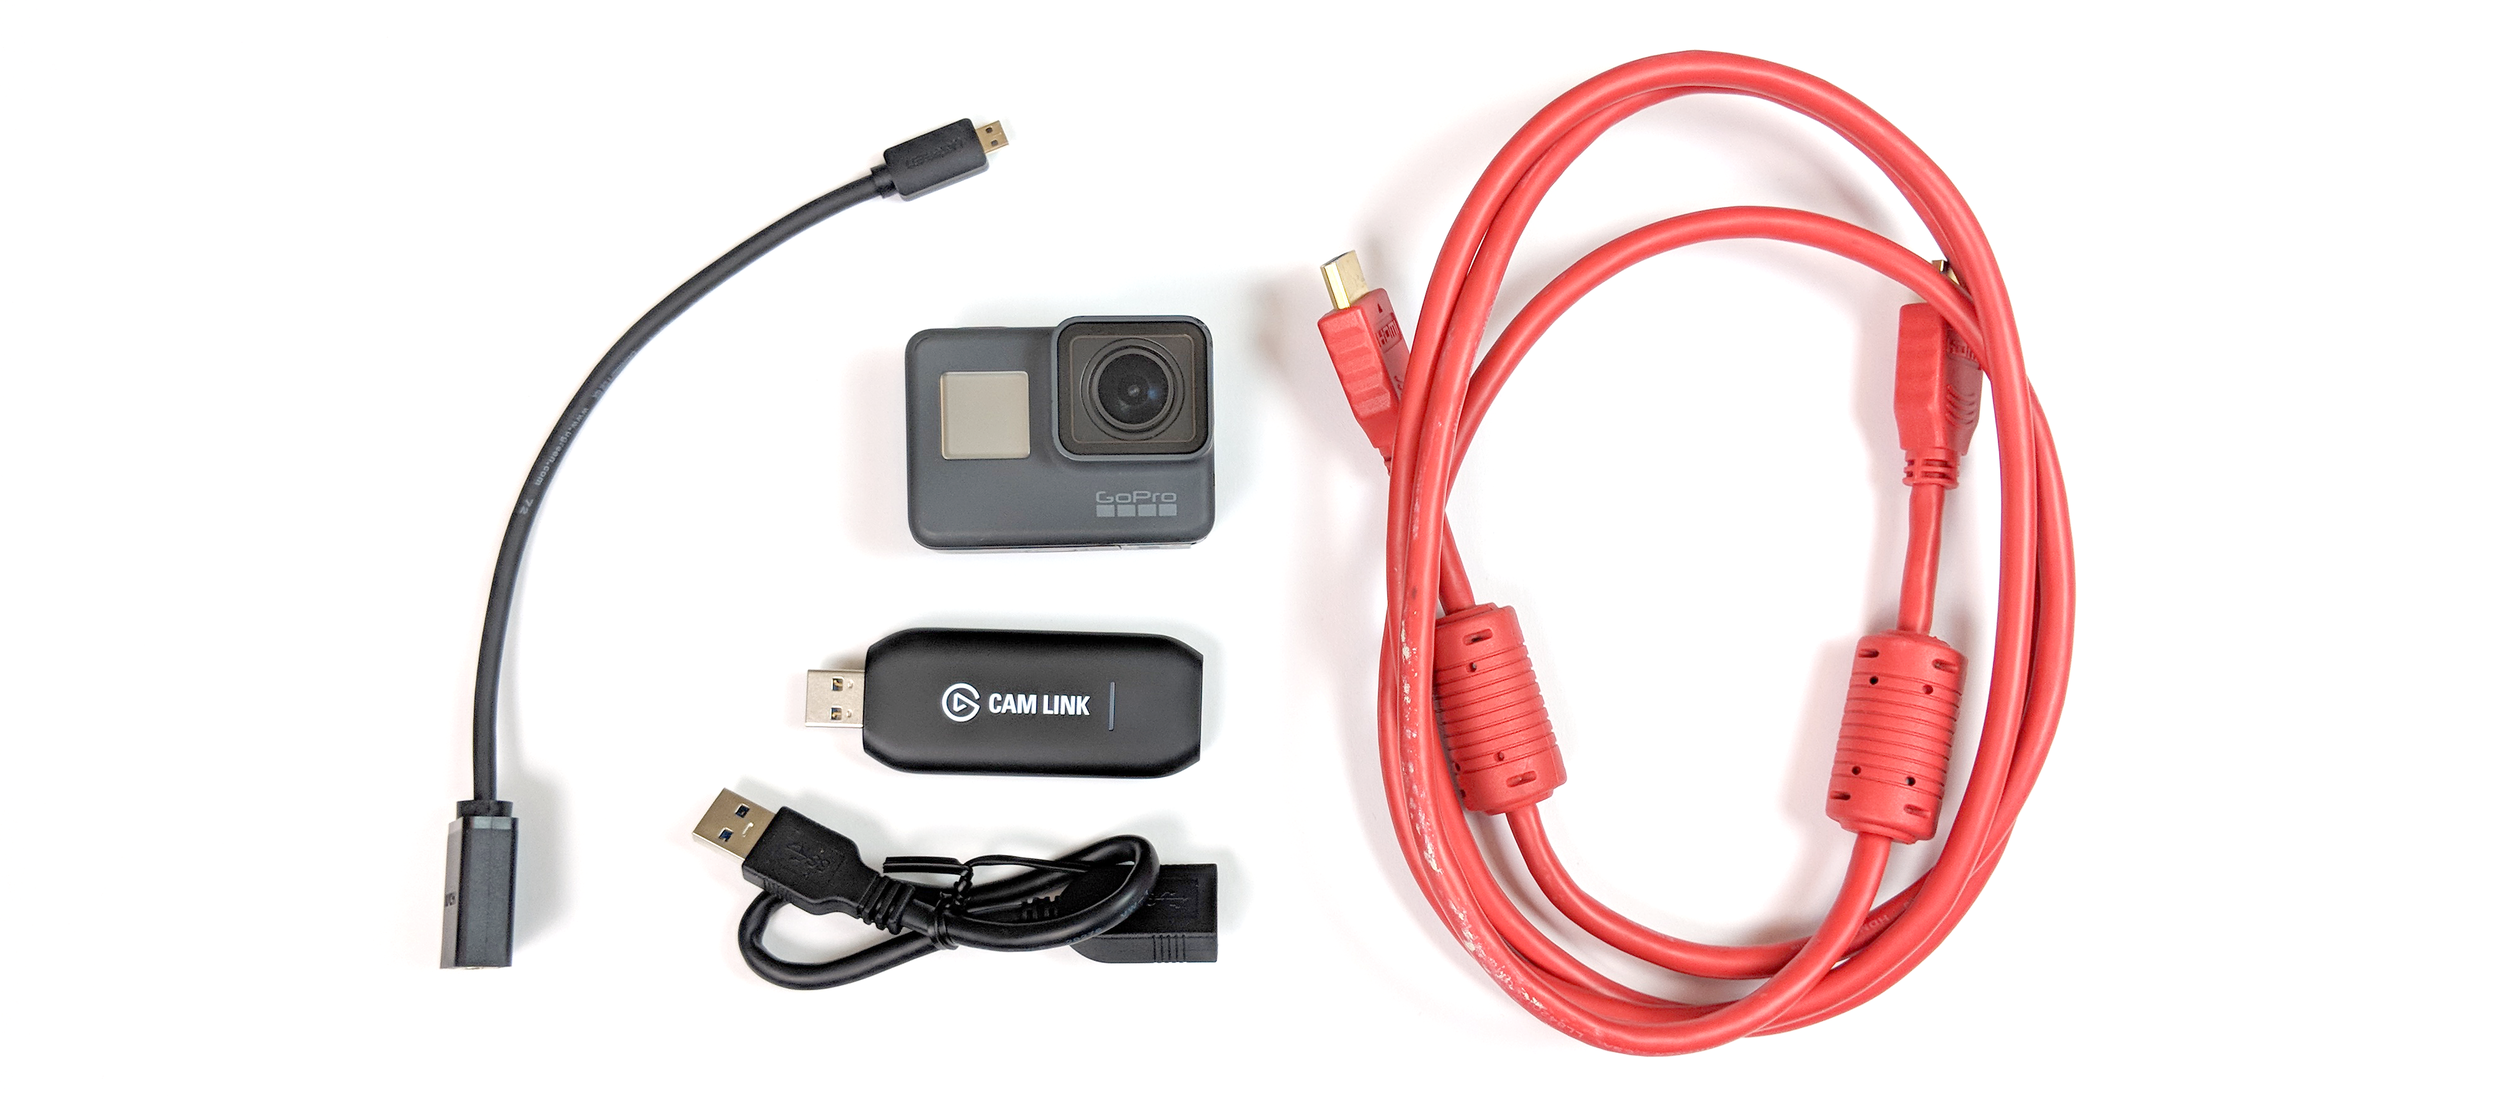 gopro+streaming+webcam+reddit+elgato+camlink+tutorial+guide+knowhero.png